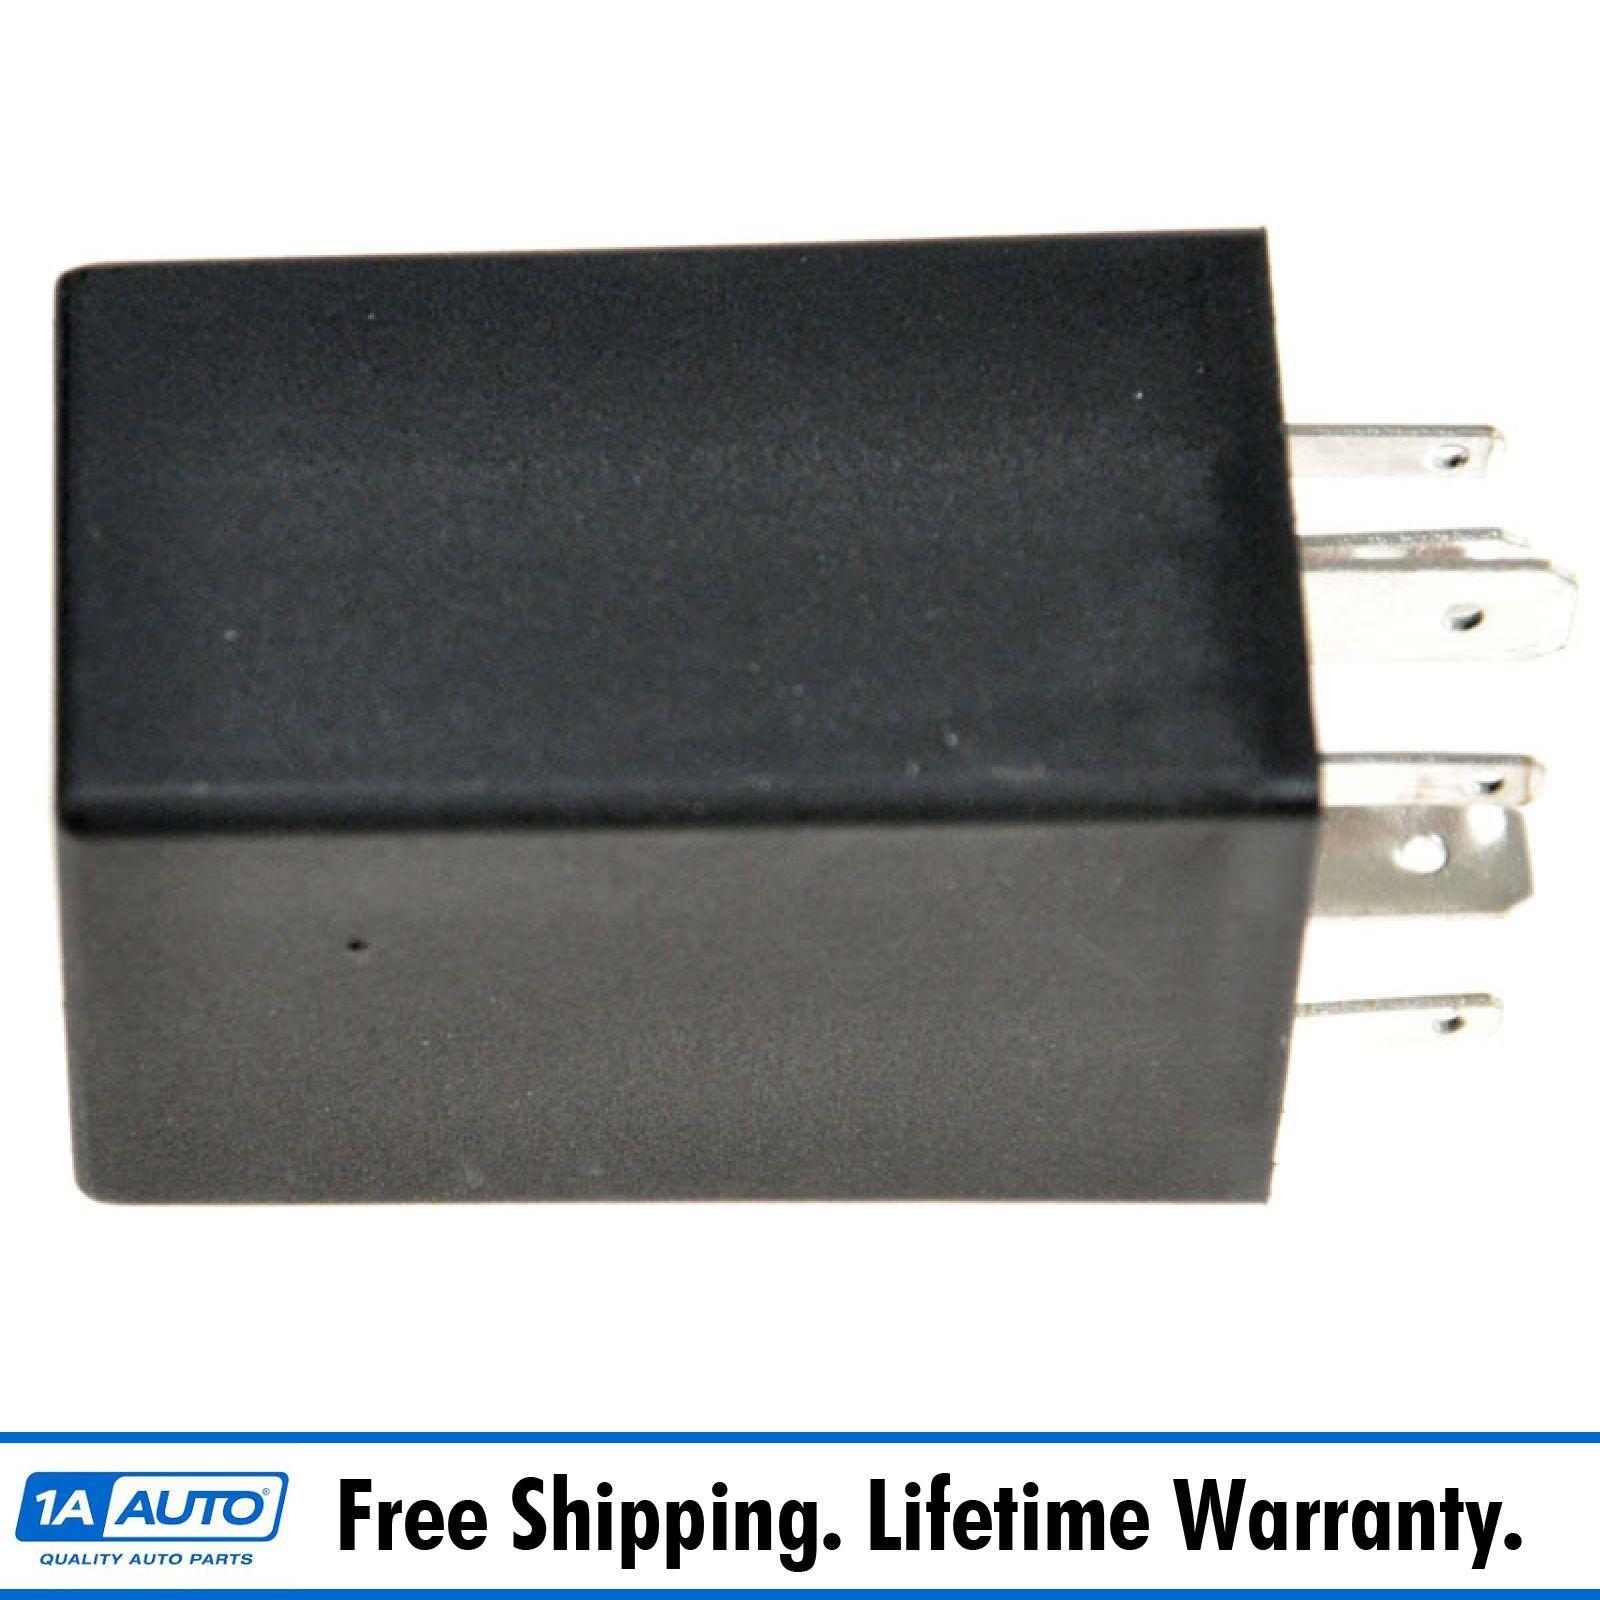 Relay Fuel Pump Digital Motor Electronics Dme For Porsche 911 924 944 968 191213445198